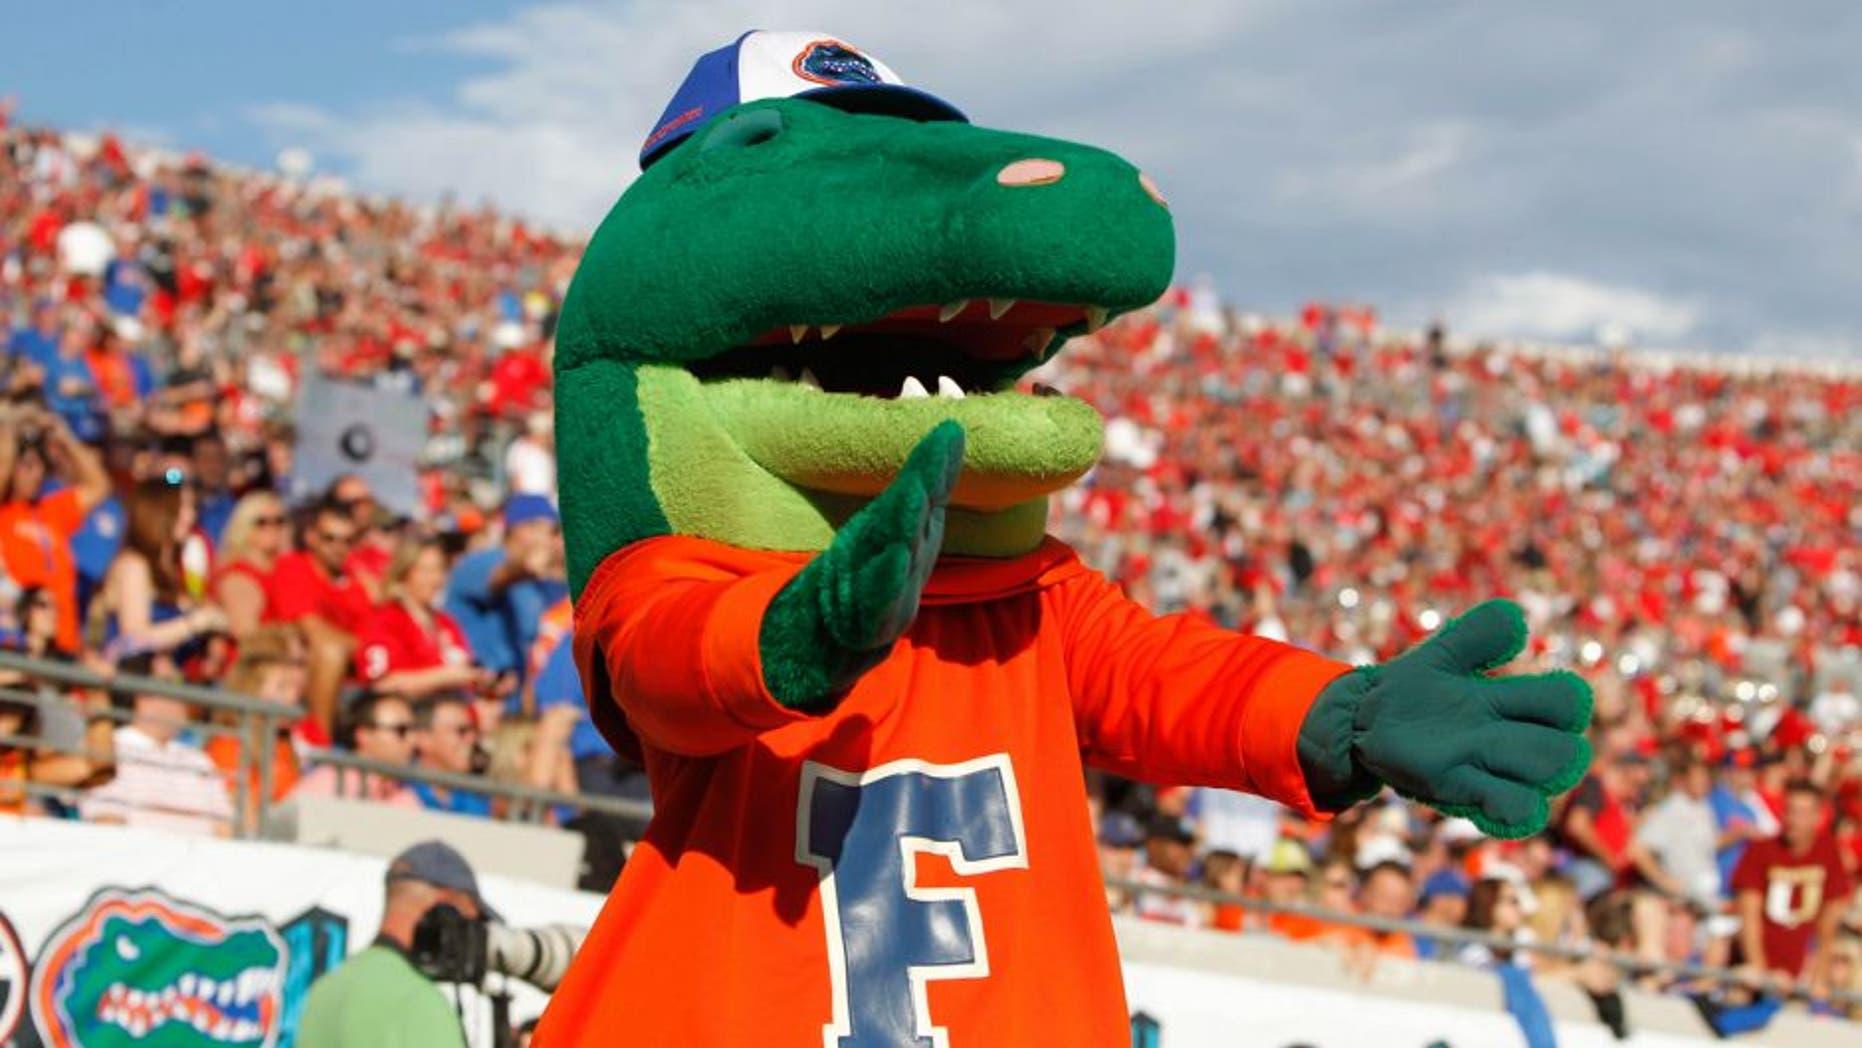 Nov 2, 2013; Jacksonville, FL, USA; Florida Gators mascot, Albert, against the Georgia Bulldogs during the second quarter at EverBank Field. Mandatory Credit: Kim Klement-USA TODAY Sports